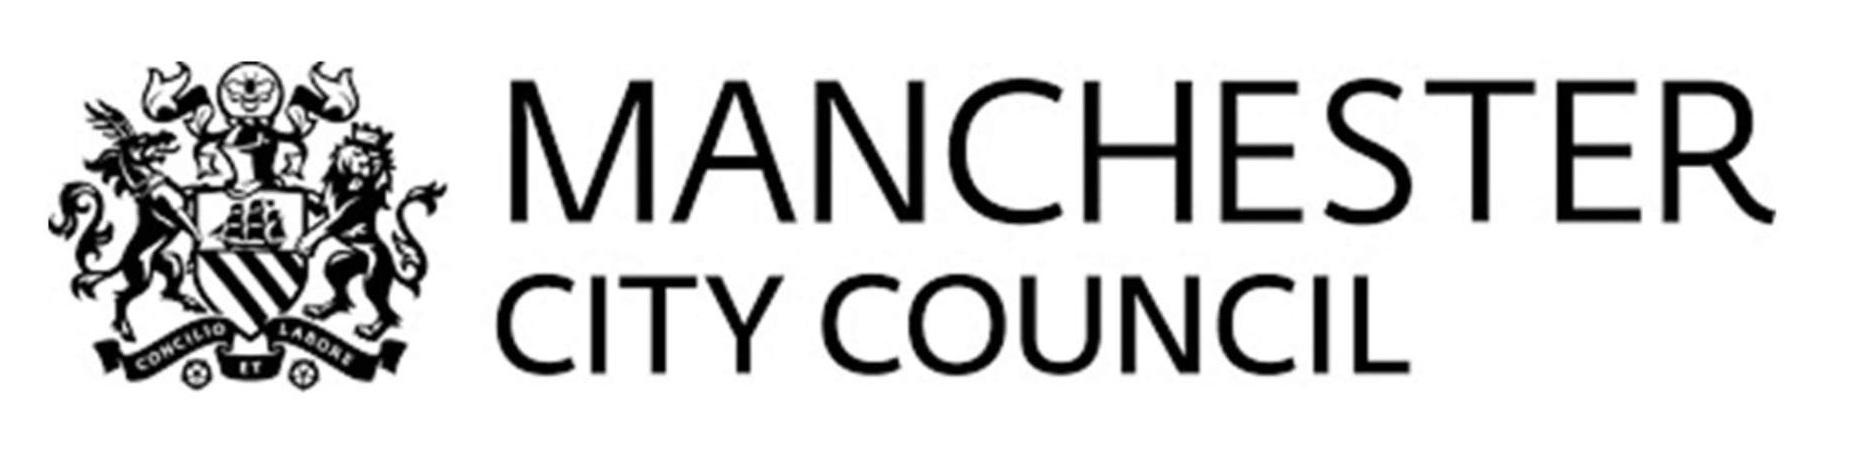 Manchester-City-Council-logo+2.jpg